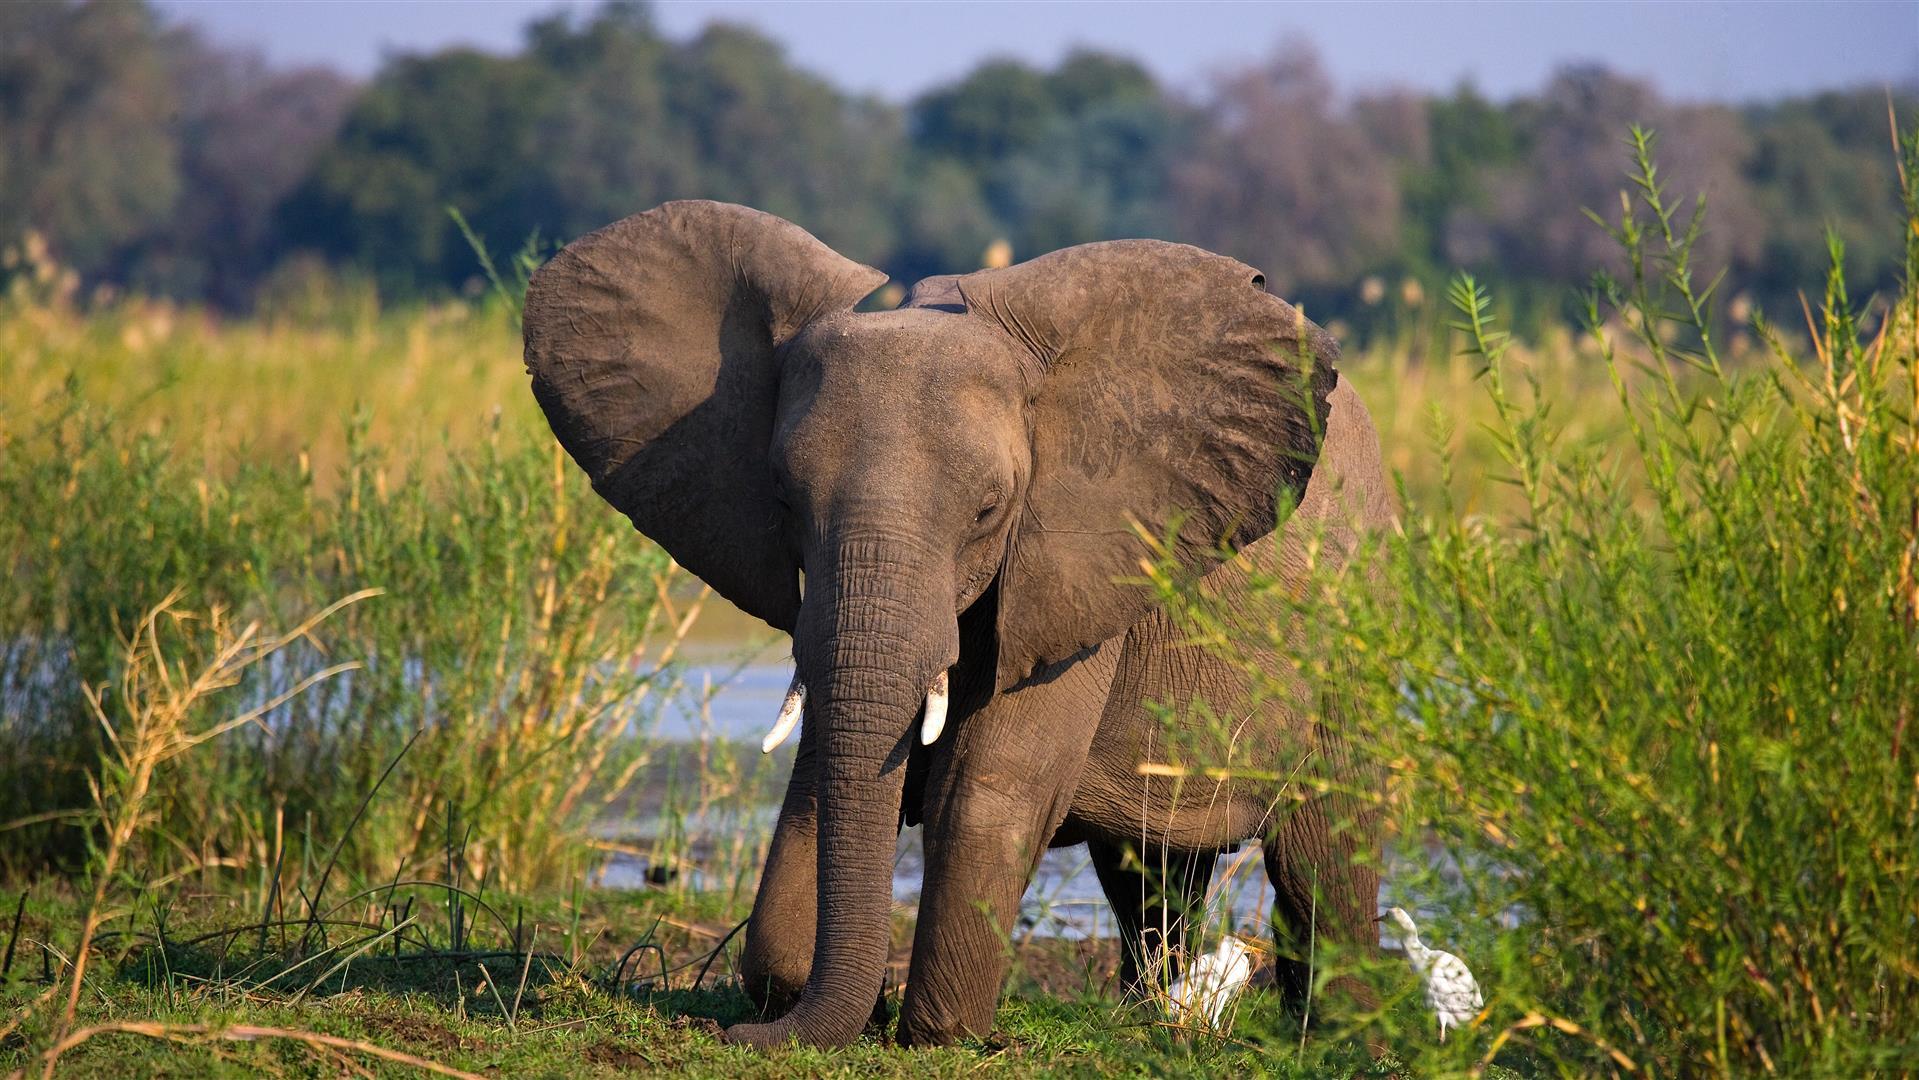 baby-elephant-walking-on-grass-zambezi-national-park.jpg